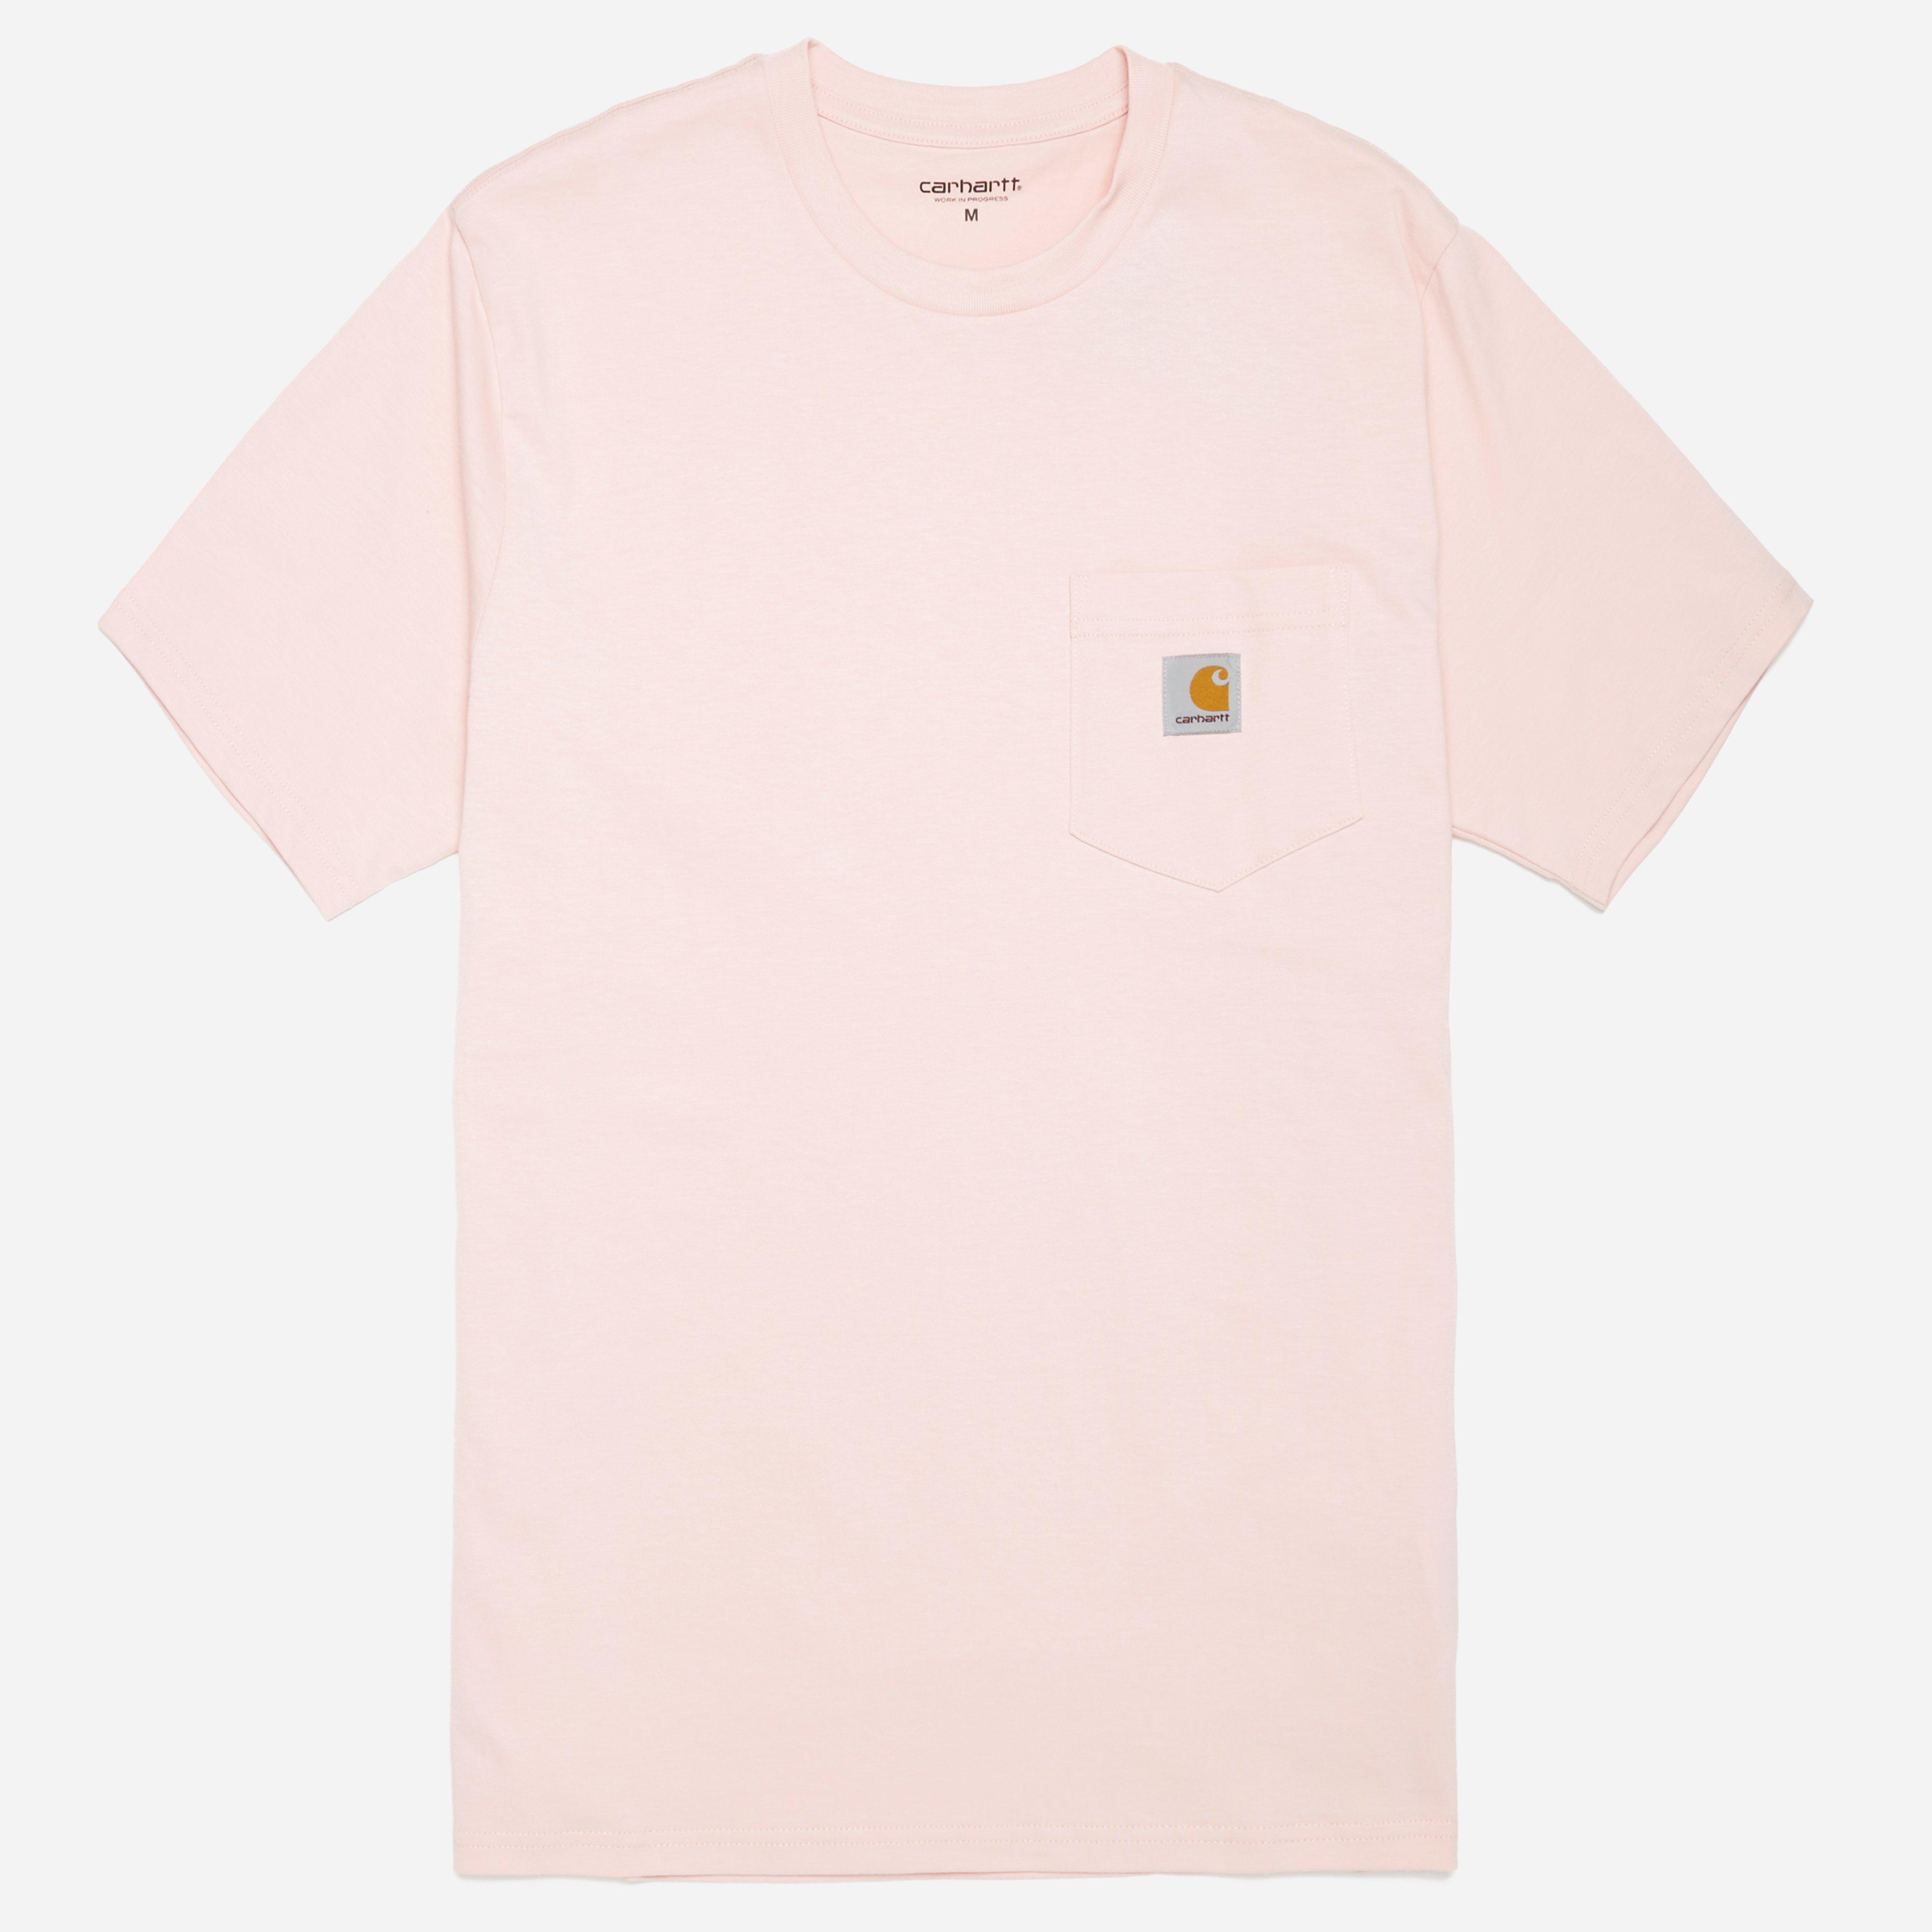 Carhartt WIP Single Jersey Pocket T-shirt